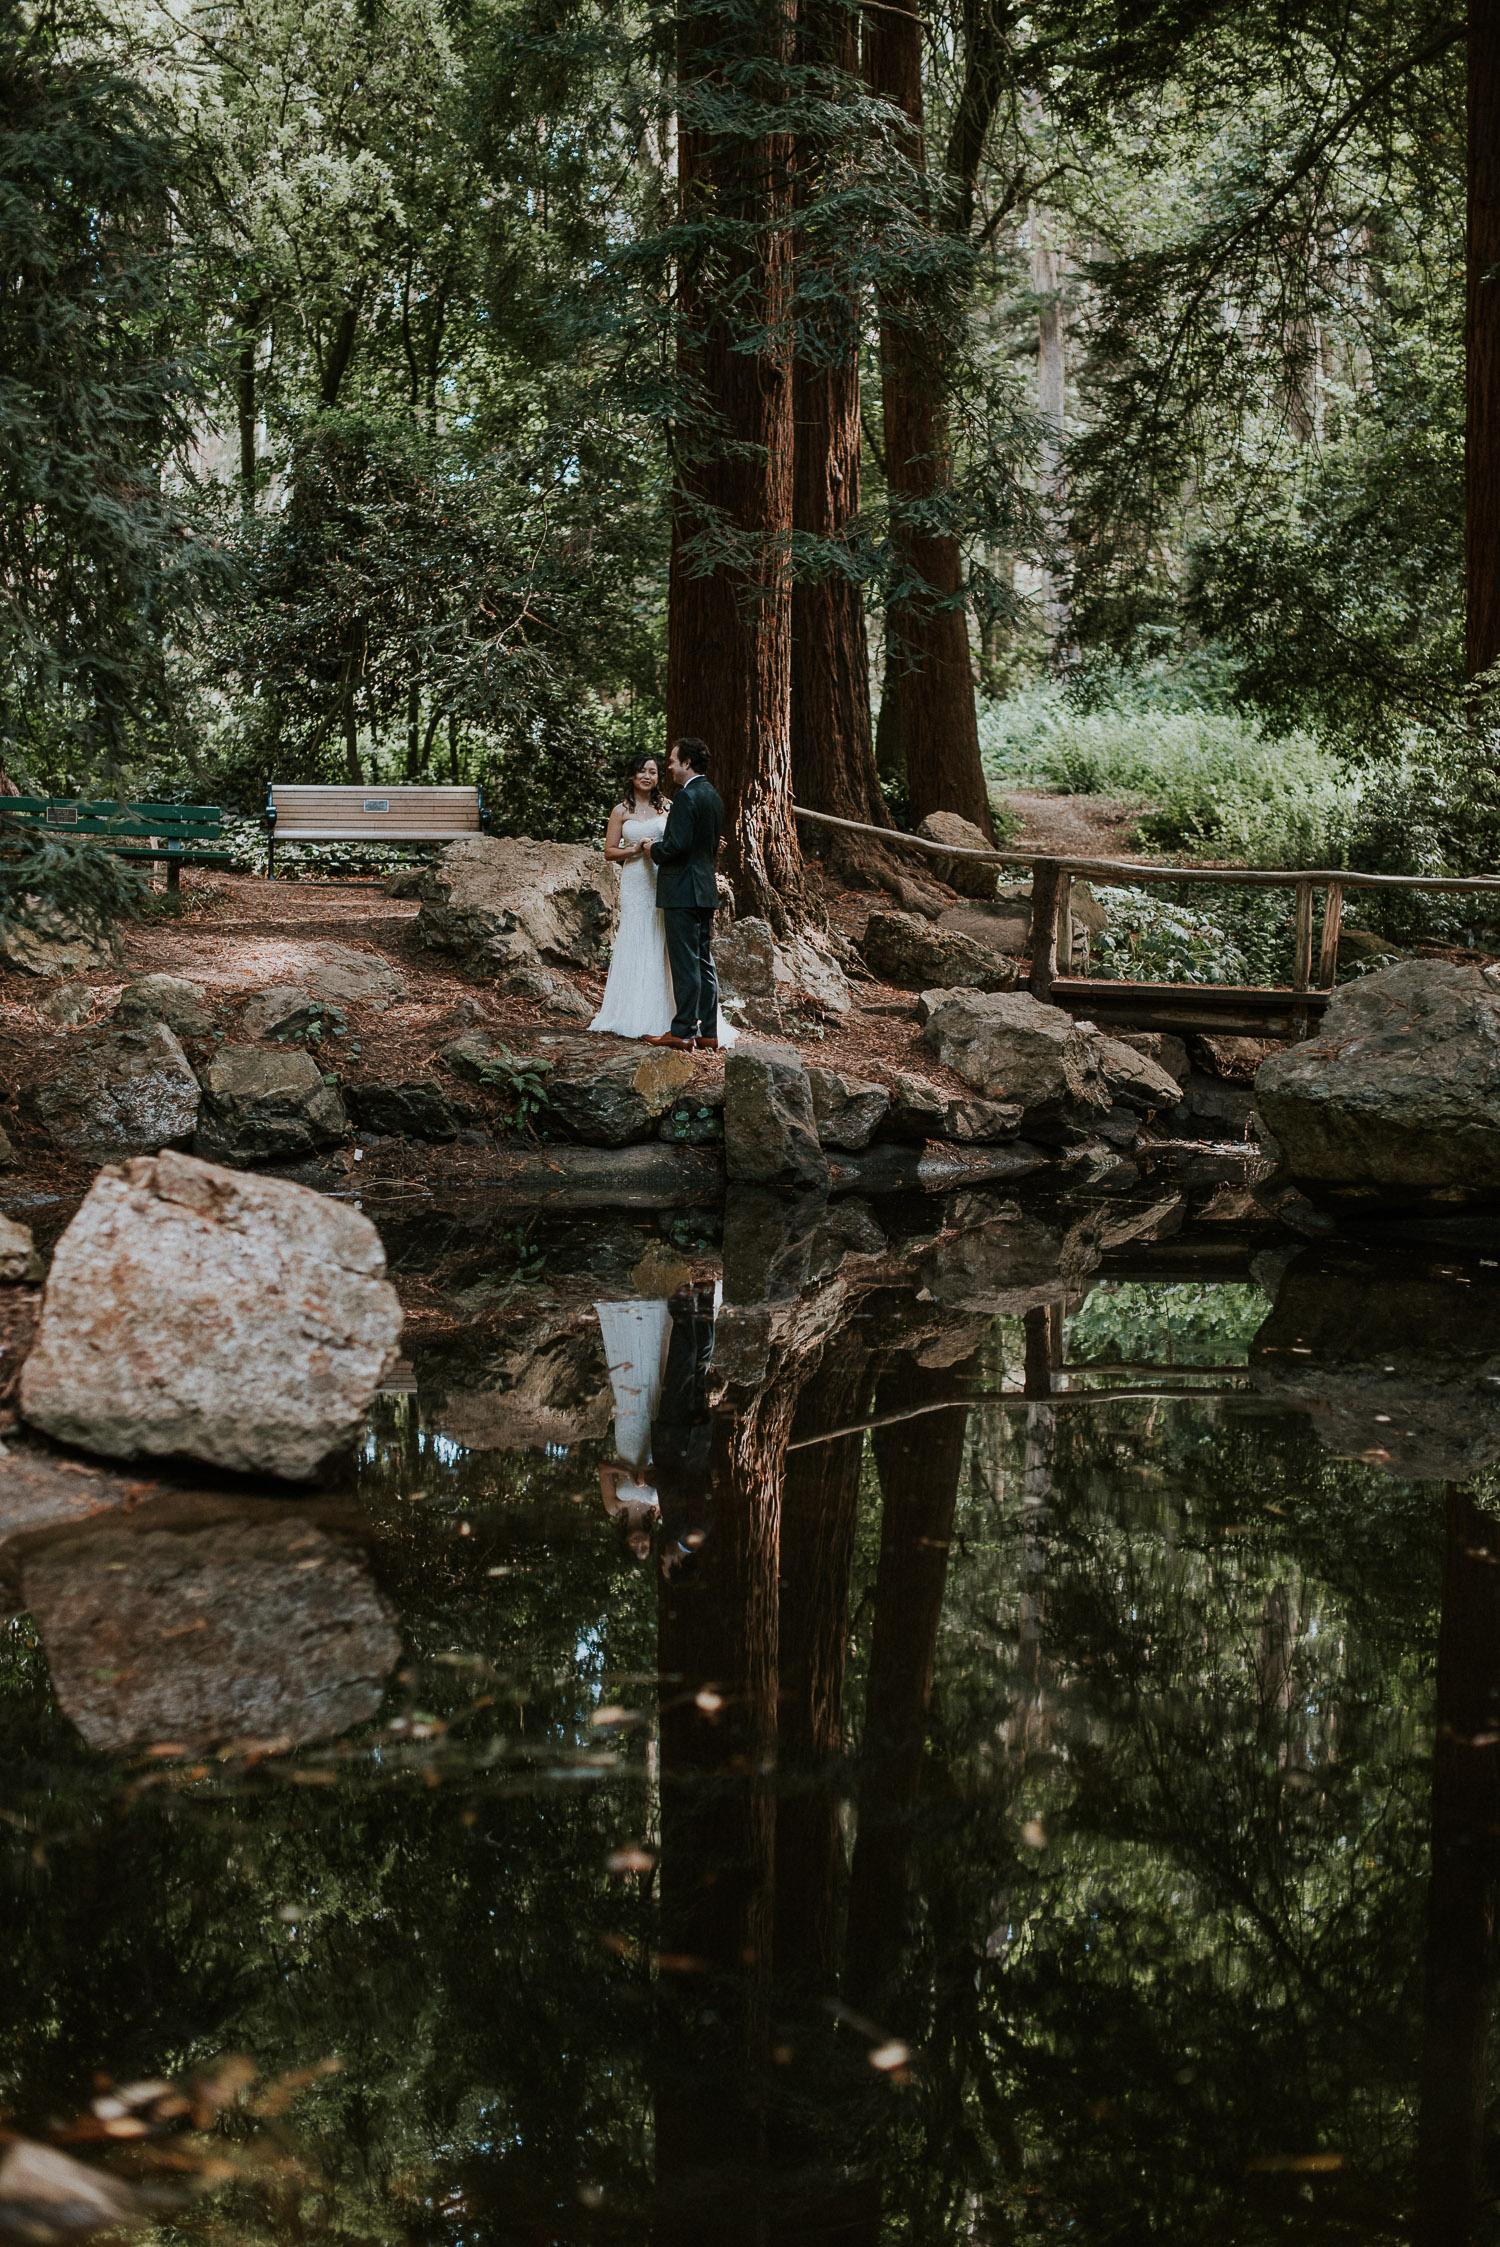 stern_grove_san_francisco_california_america_wedding_katy_webb_photography_UK26